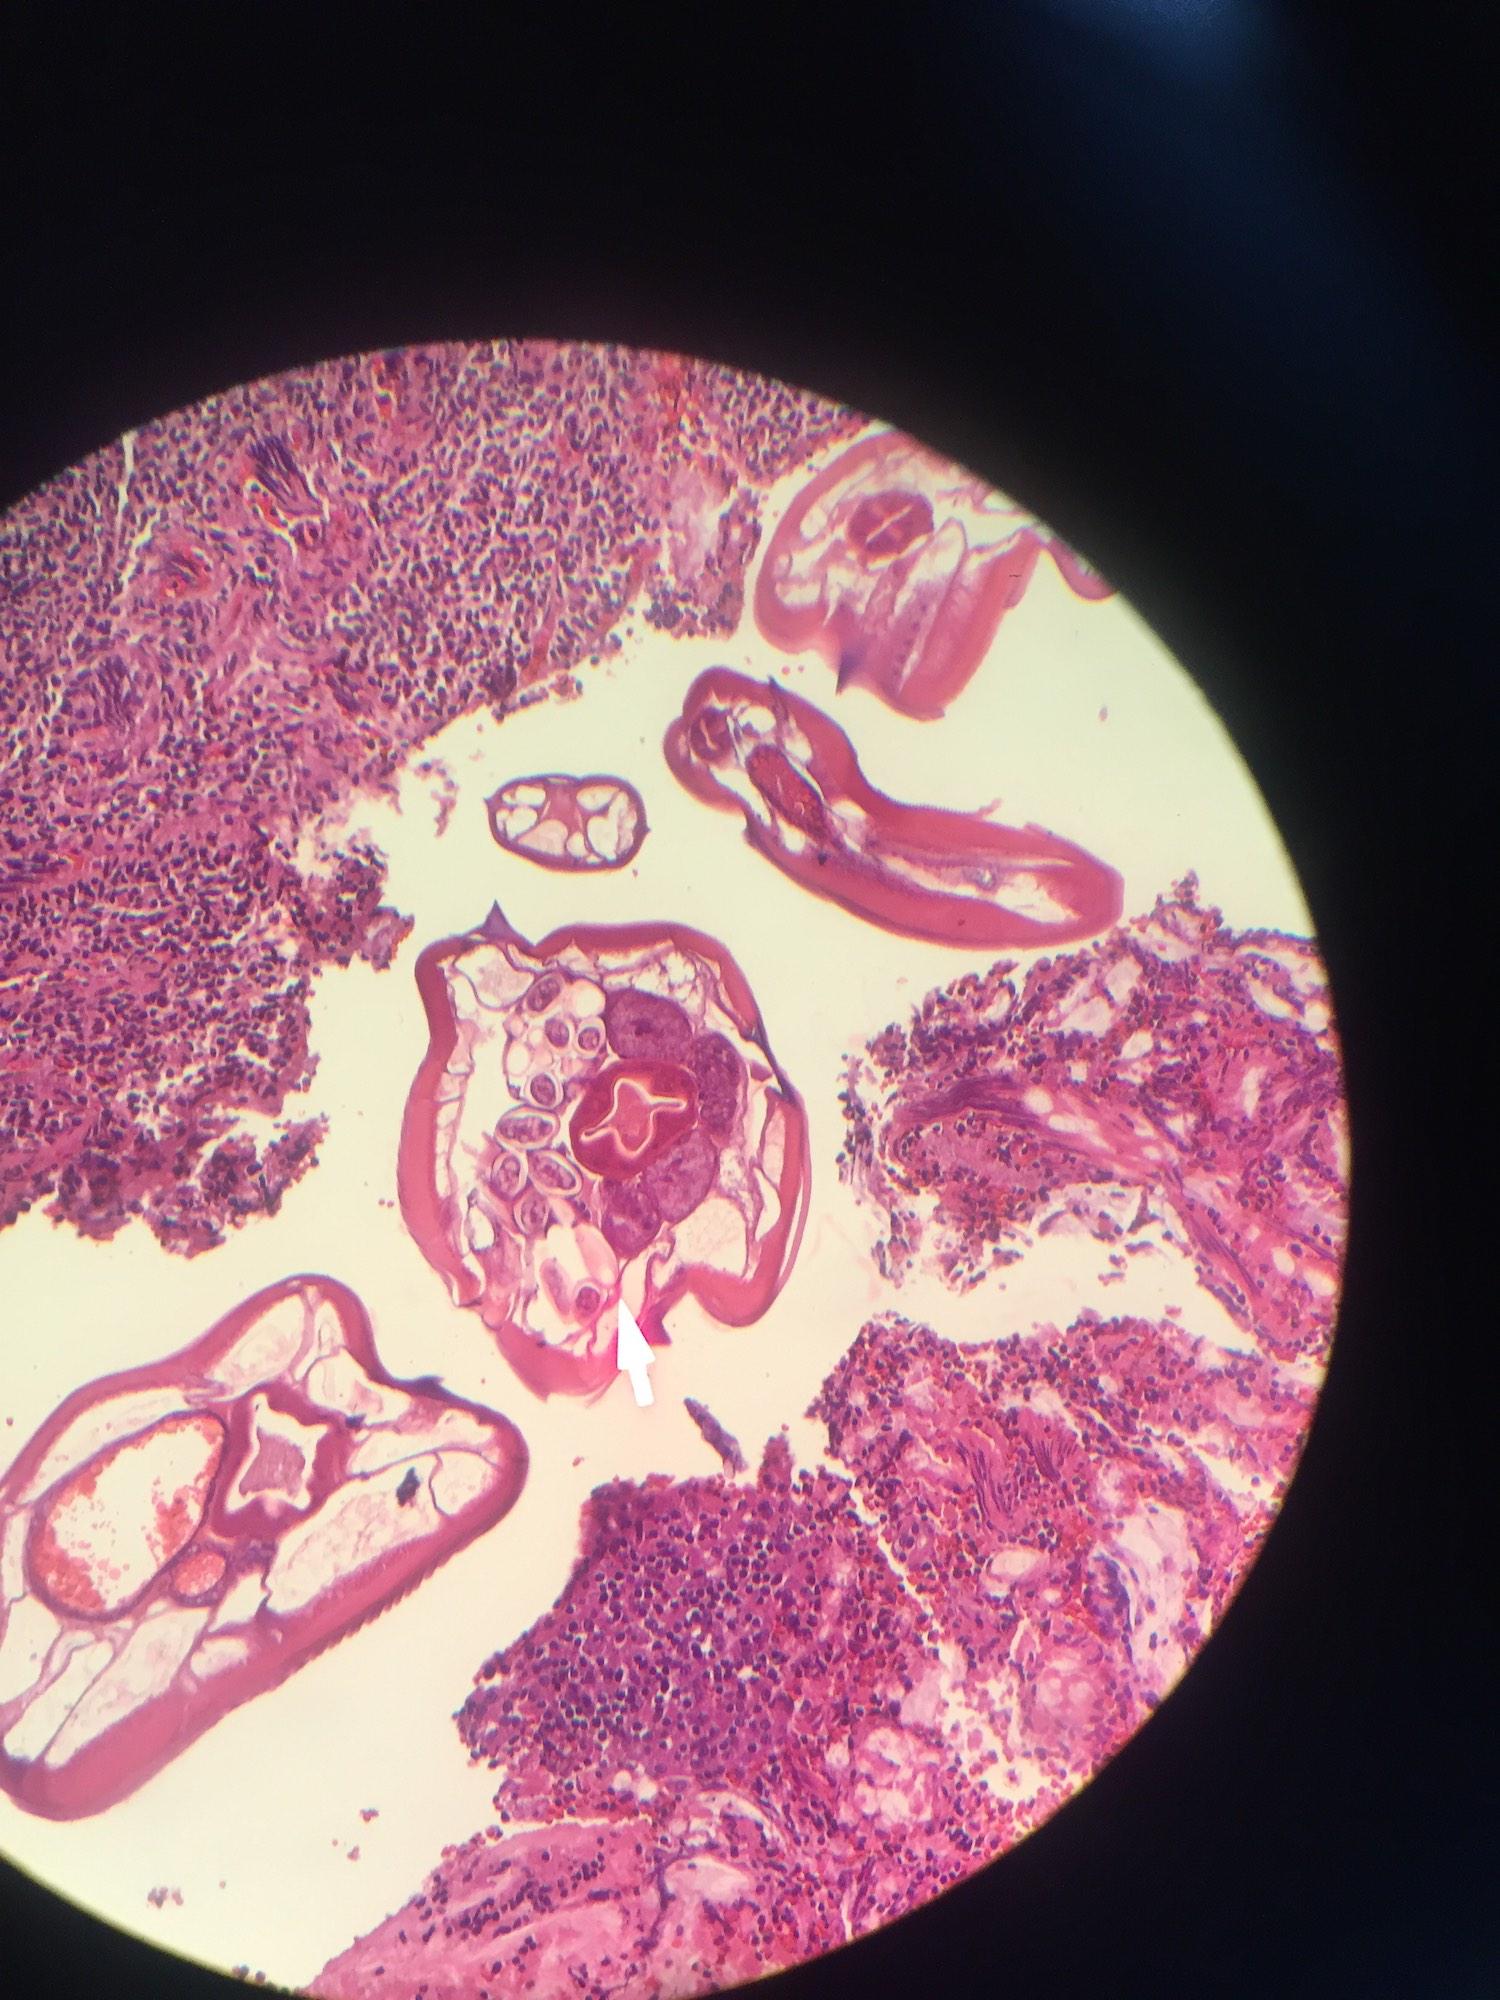 enterobius vermicularis histology